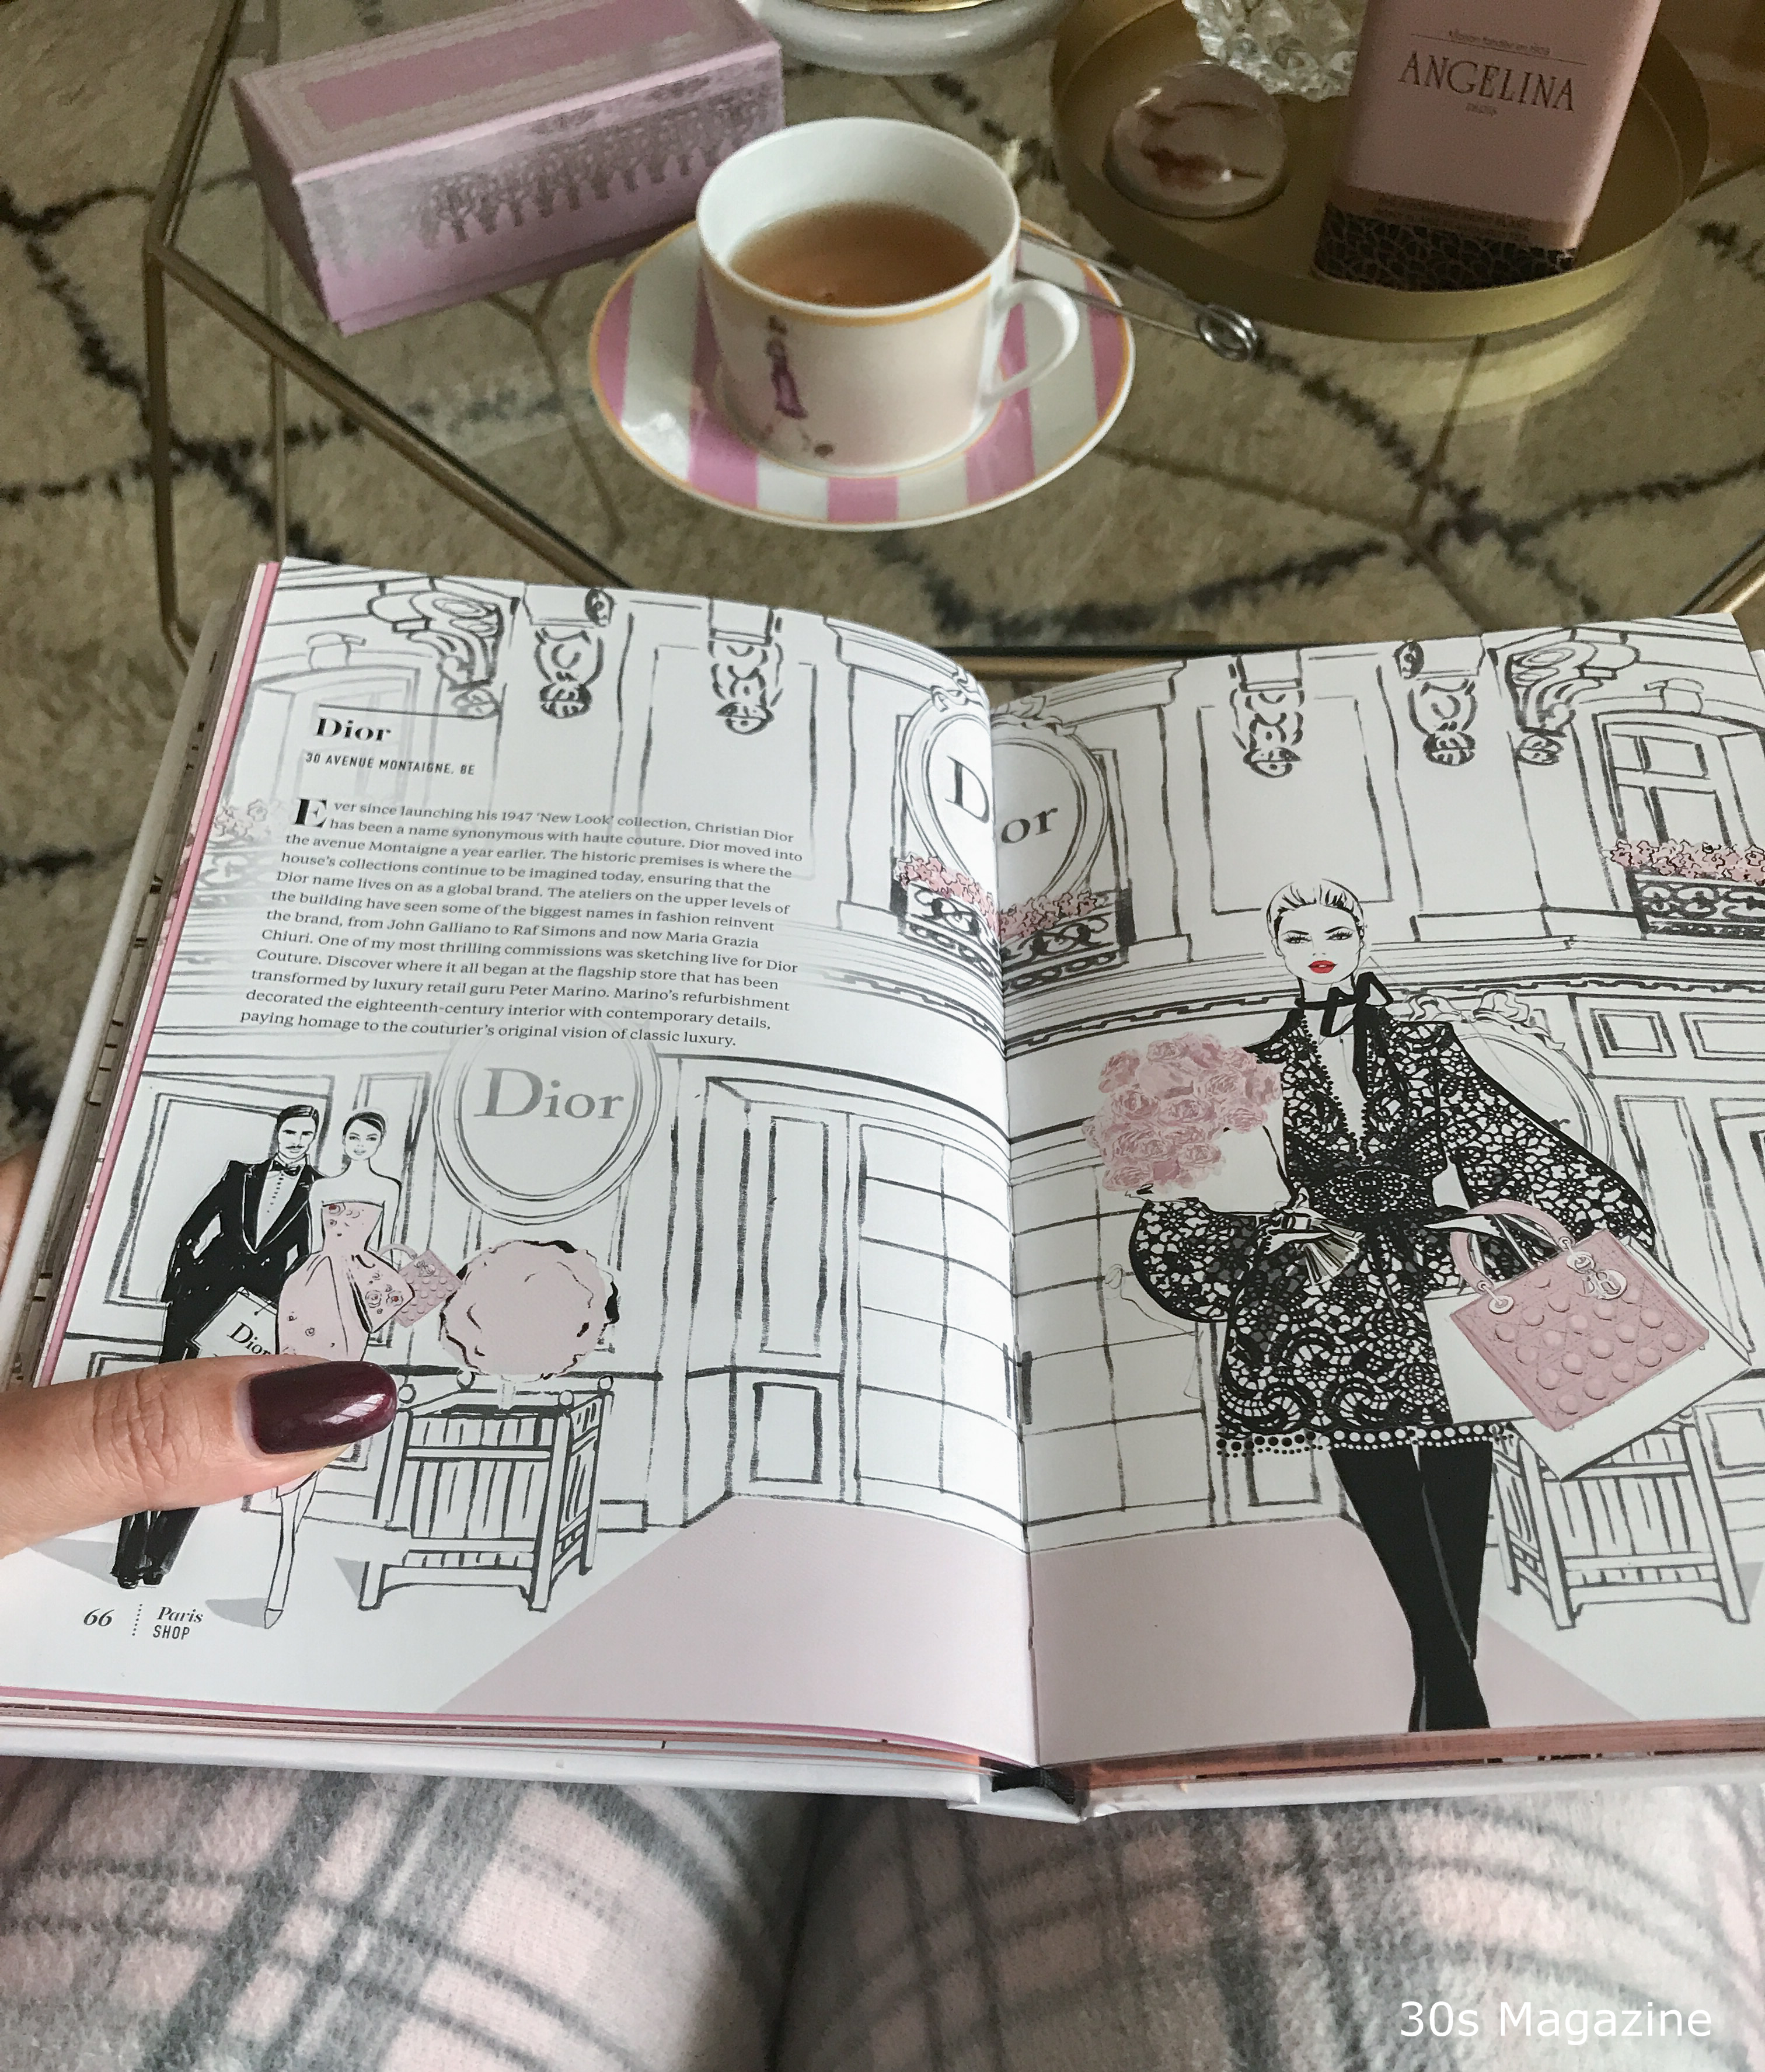 50f5a0e8d8 30s Magazine - Book review: Paris through a fashion eye by Megan Hess